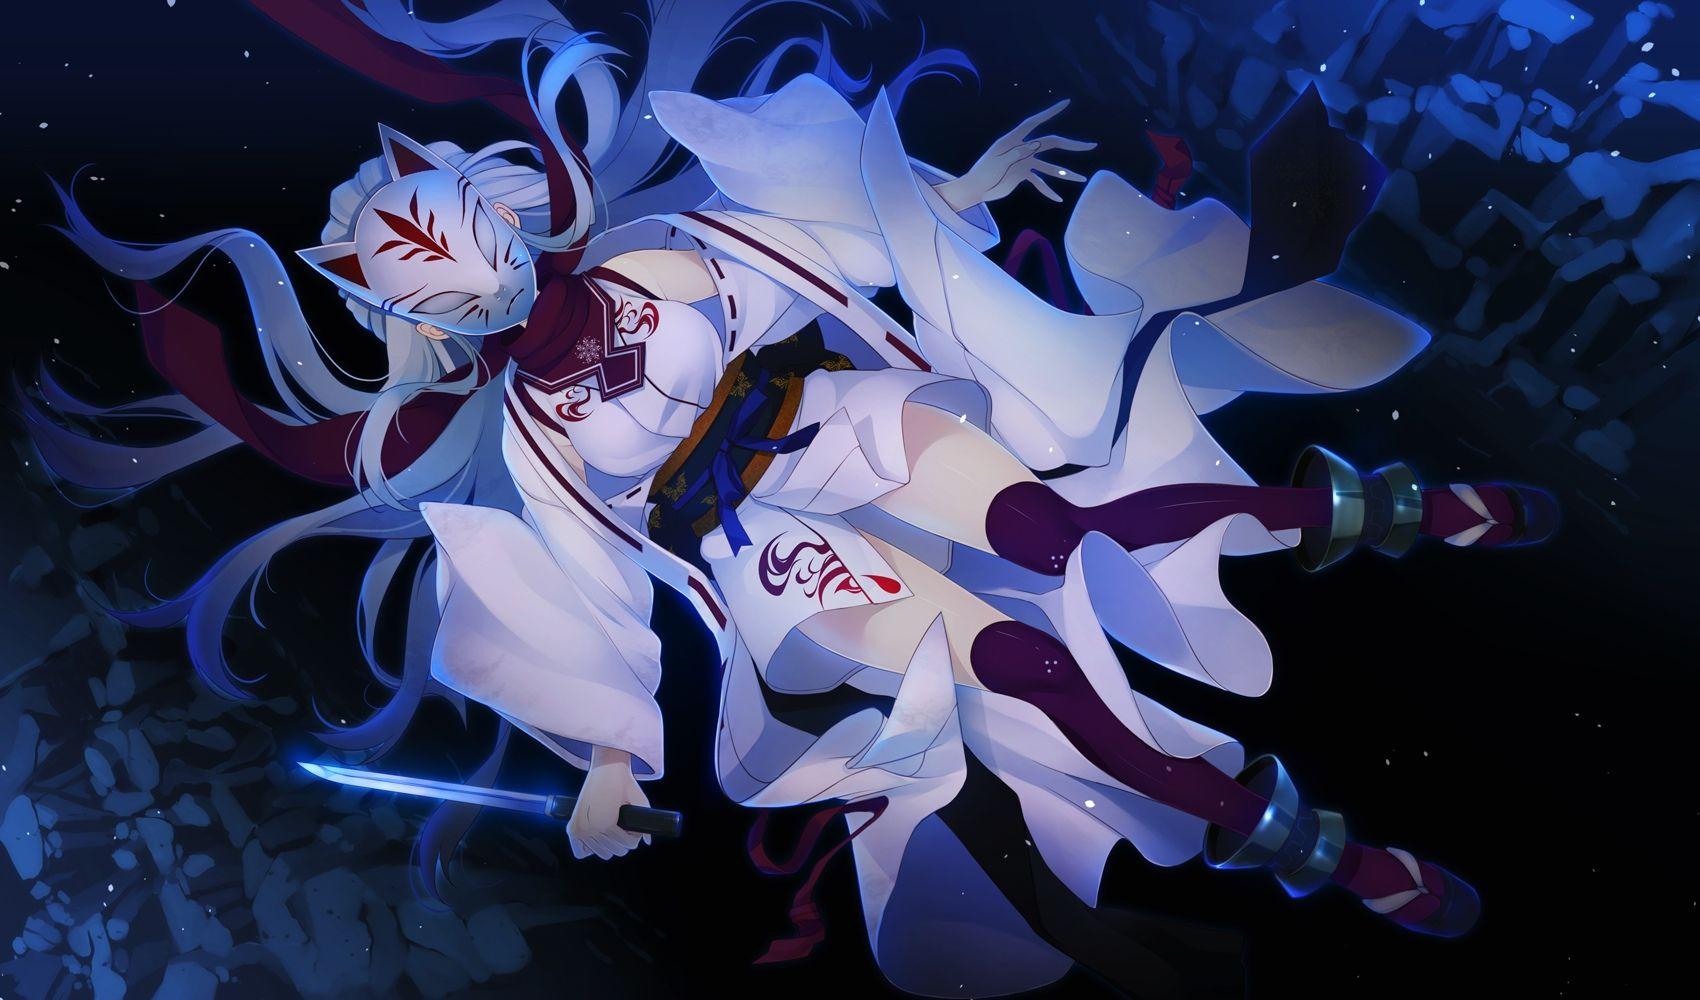 Anime Kitsune mask | Anime Characters | Pinterest ...